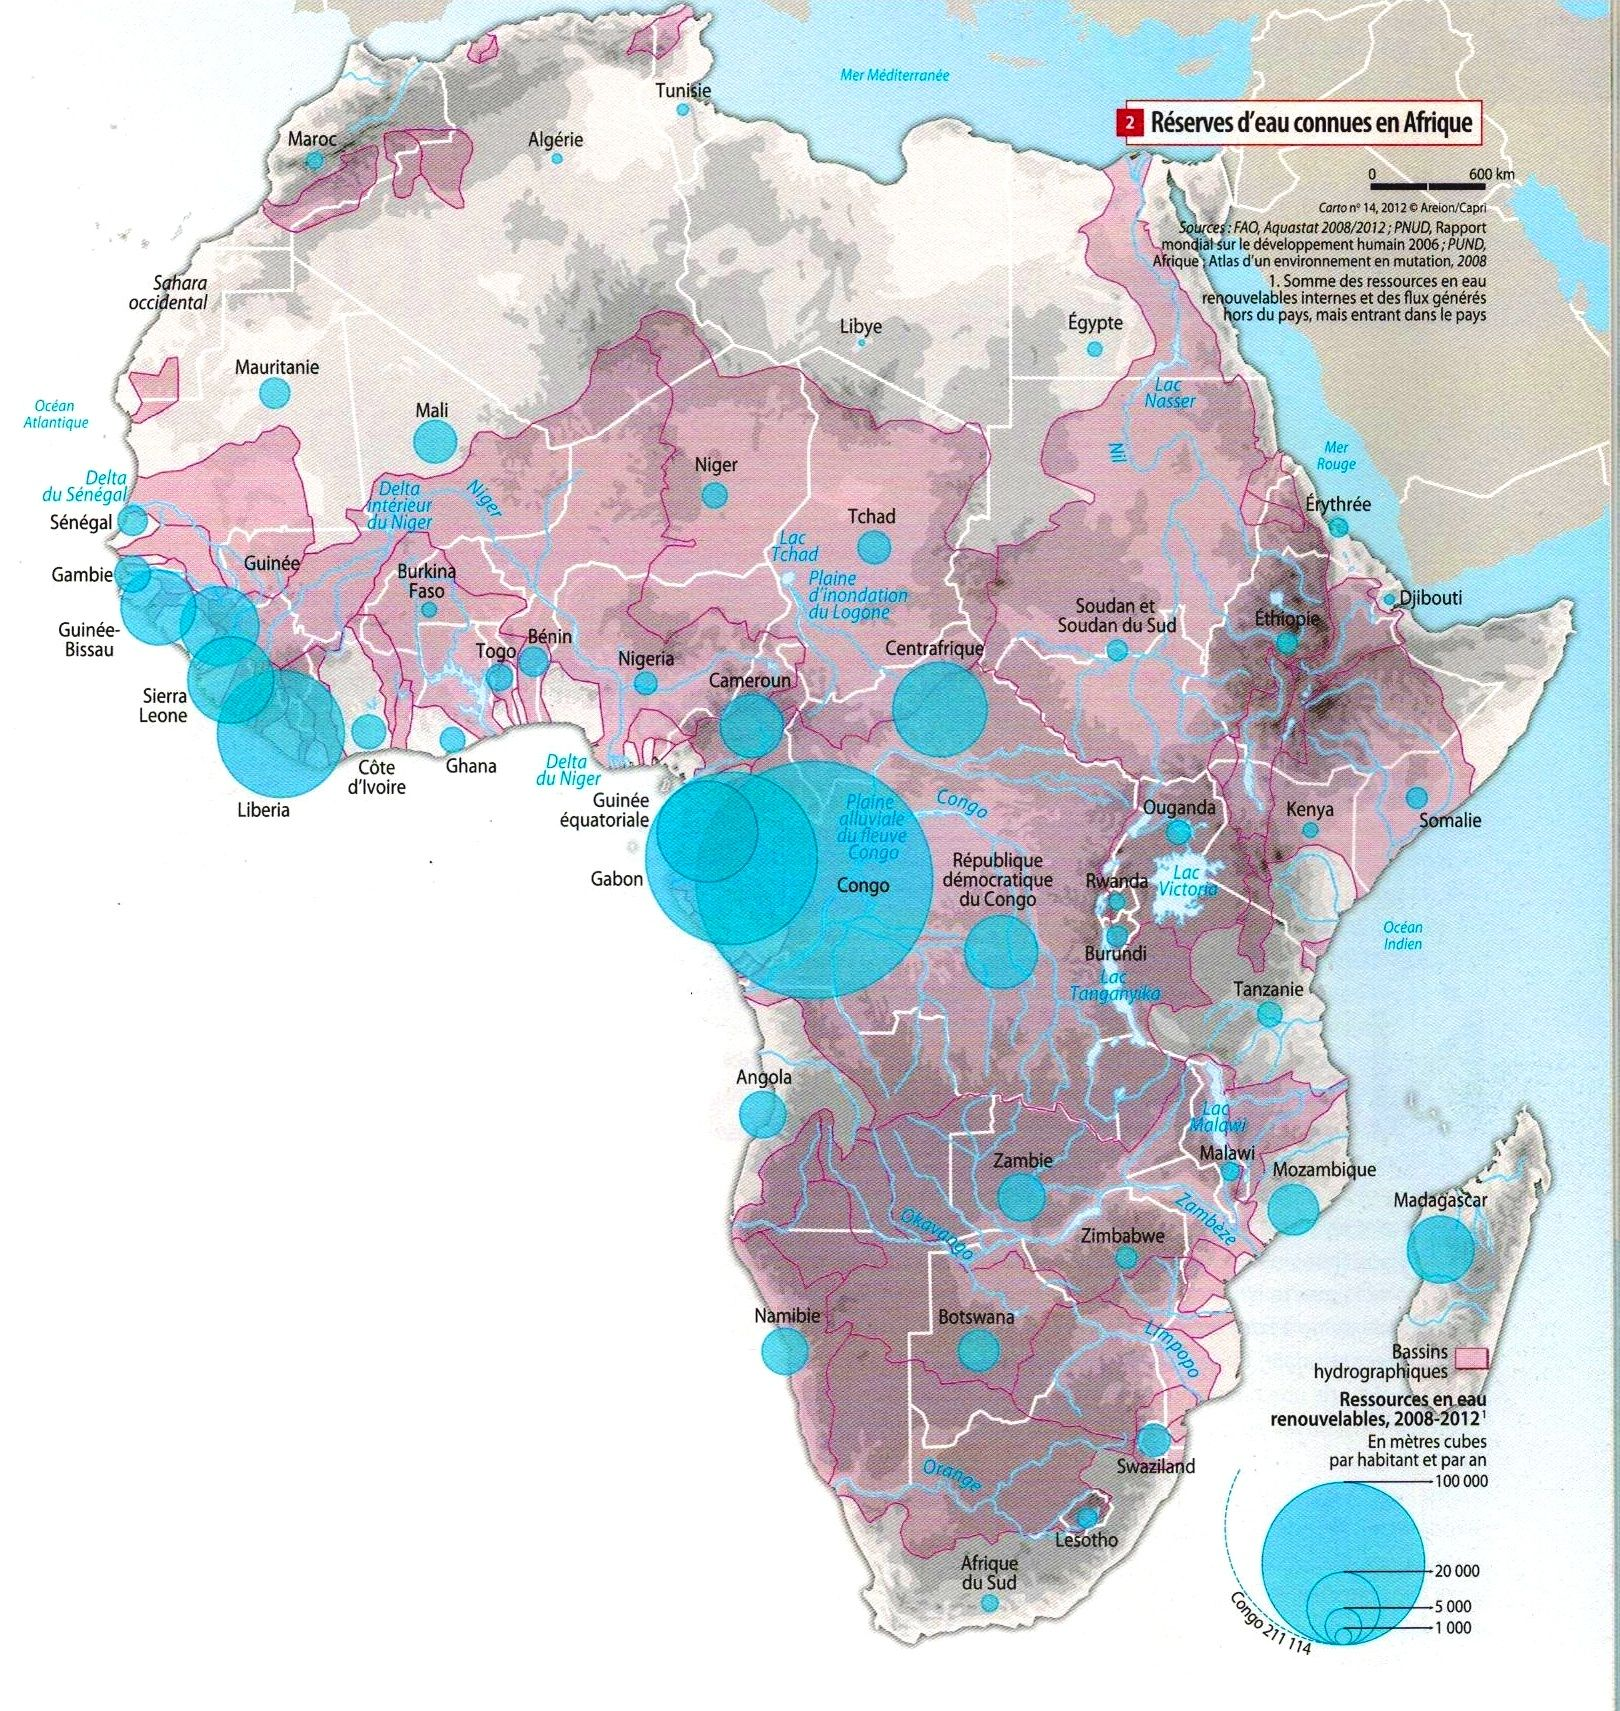 Renewable water resources in #Africa